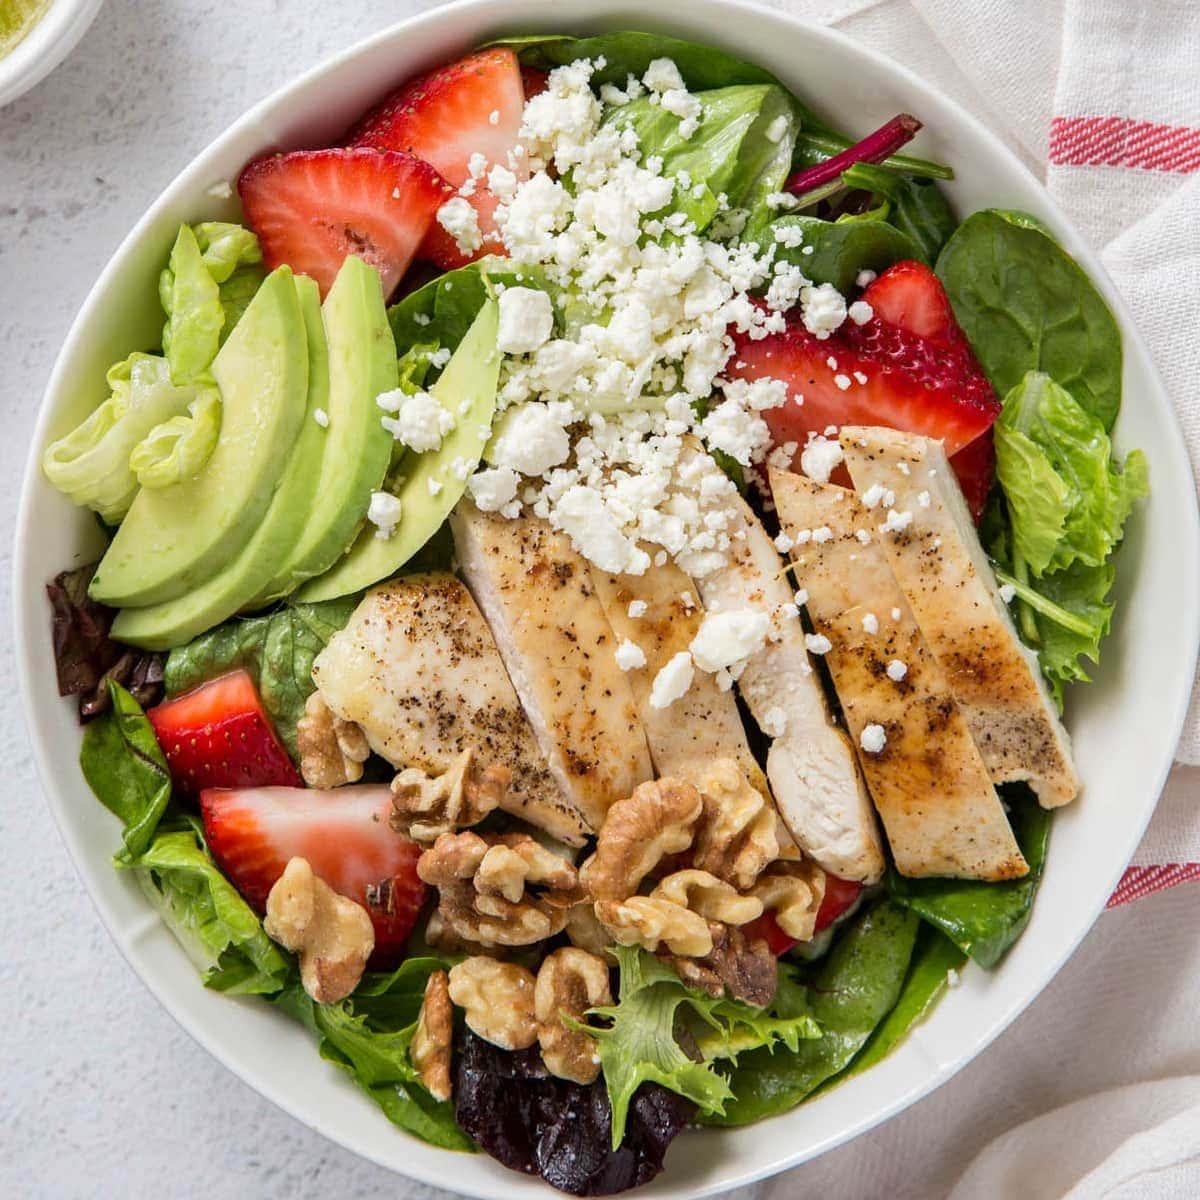 Strawberry Chicken Salad with Citrus Vinaigrette